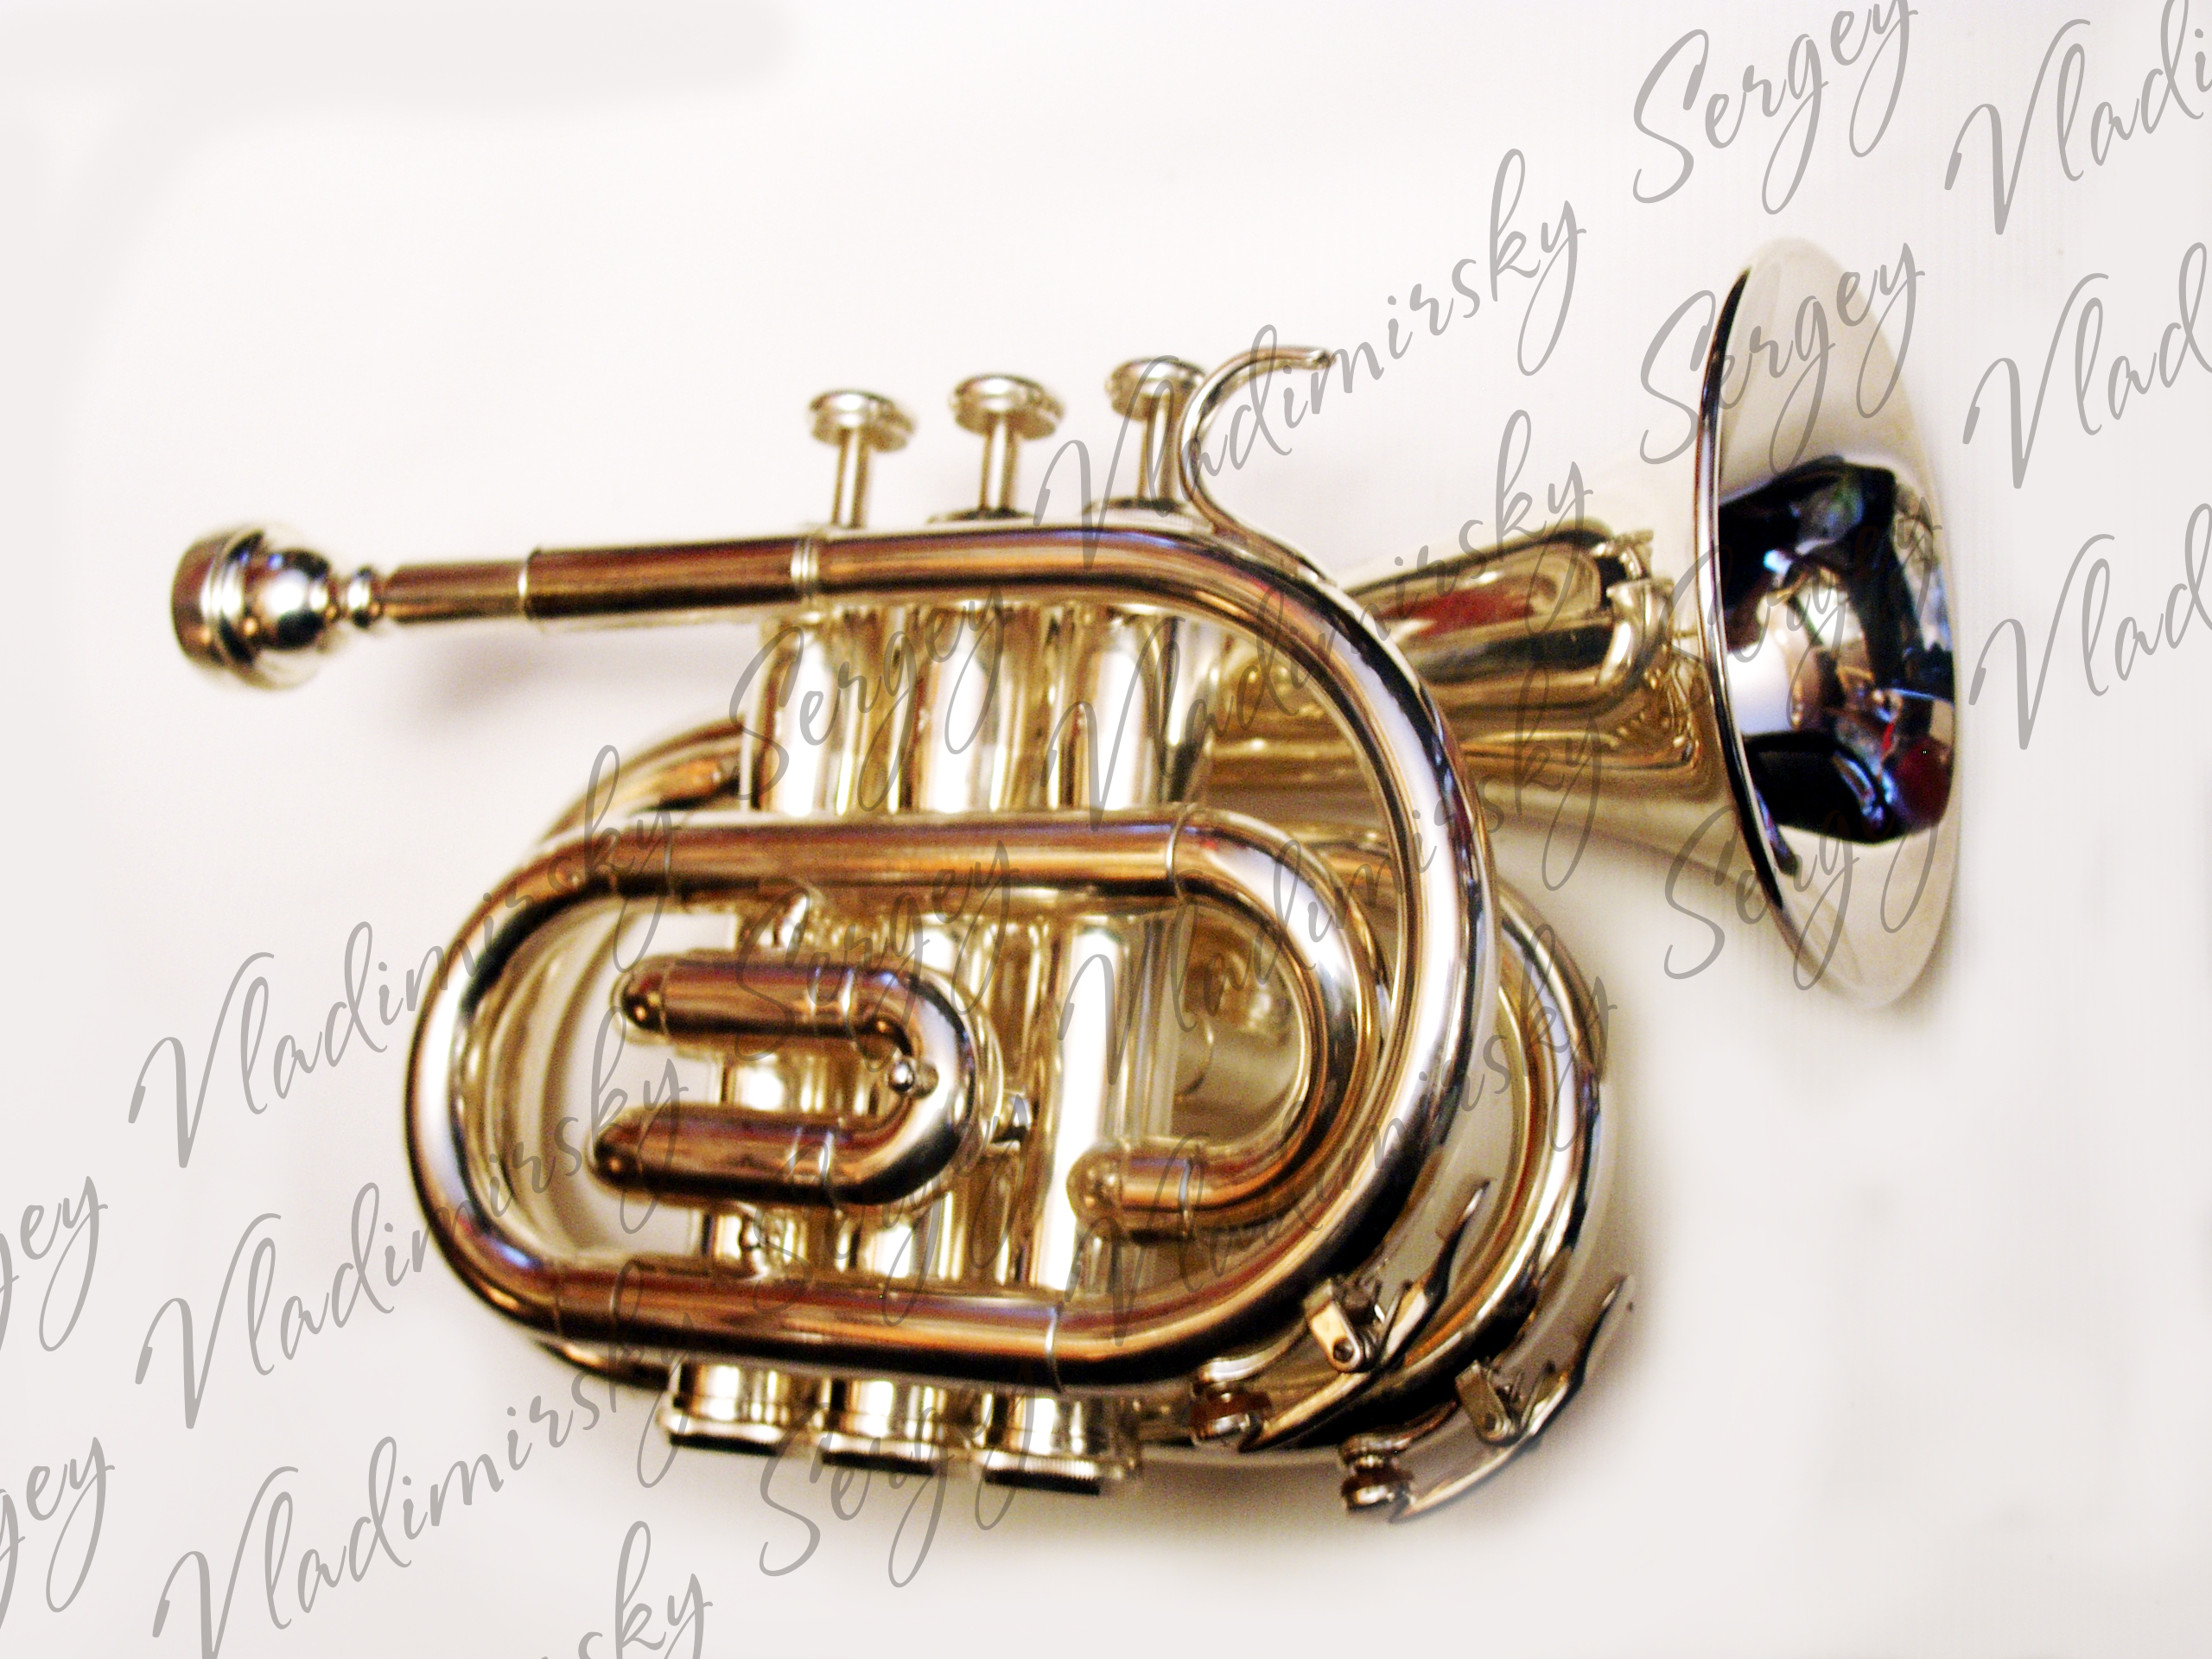 Карманная Труба (POCKET TRUMPET)